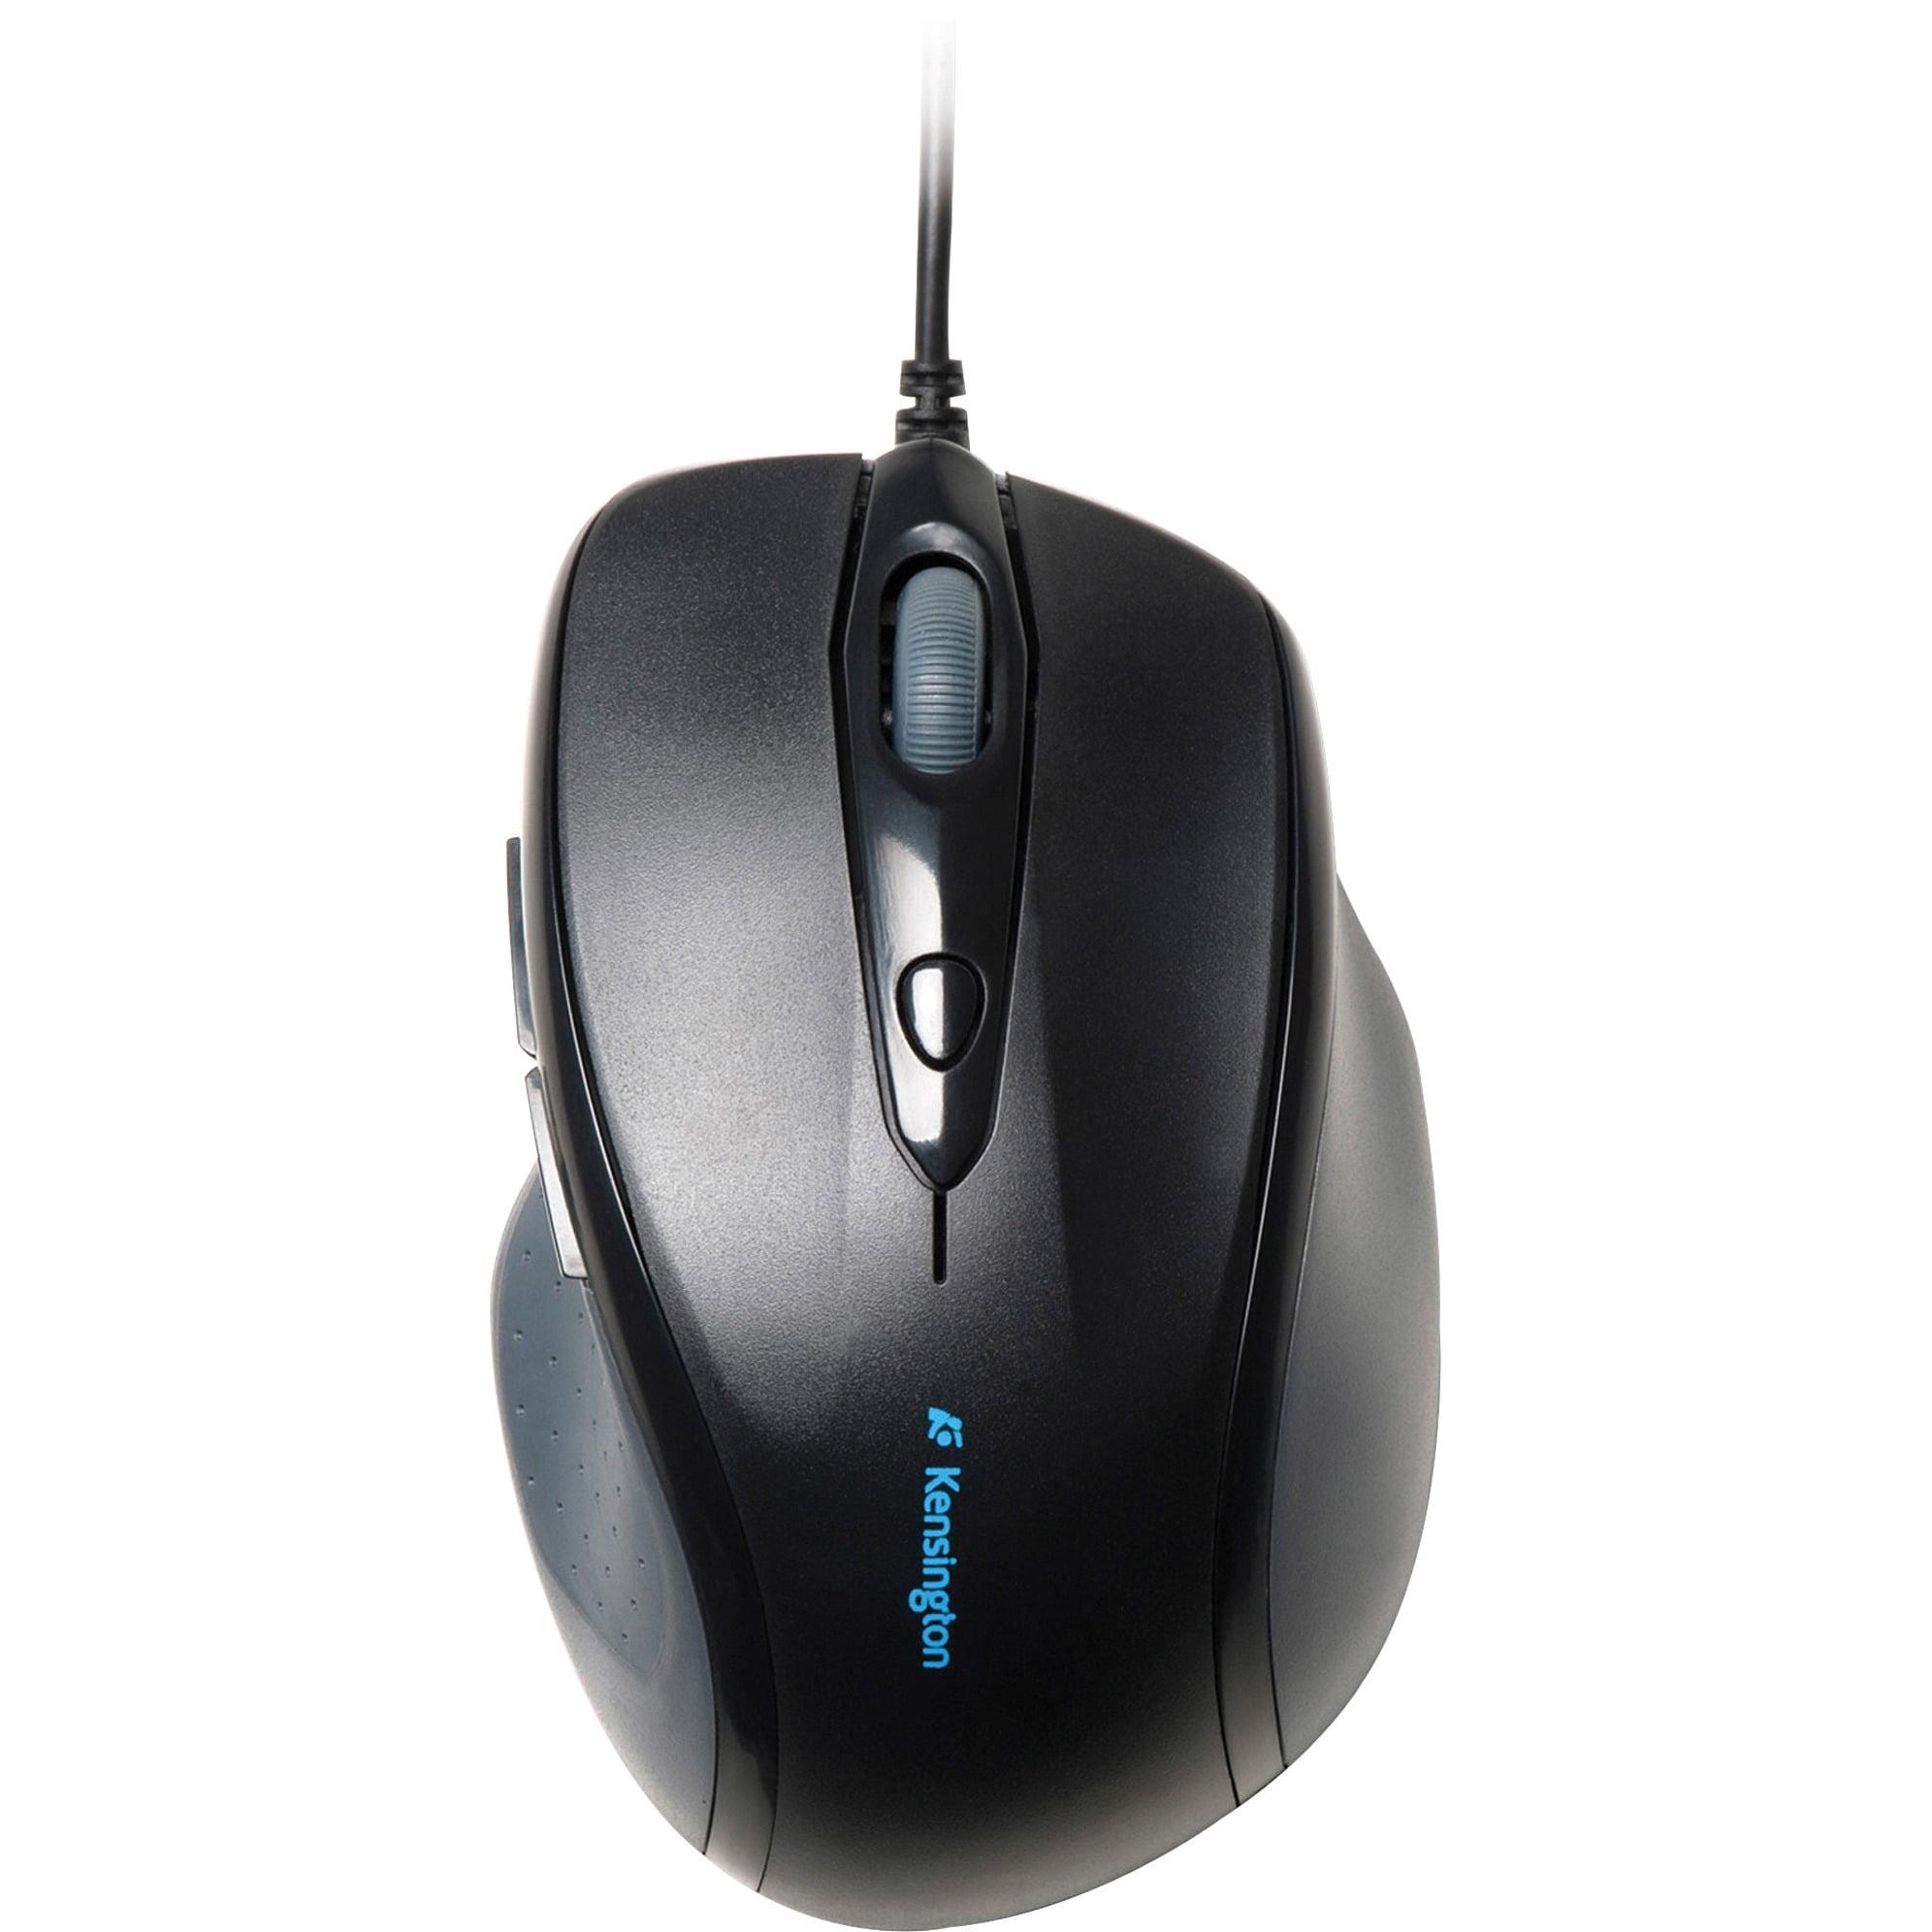 Kensington, KMW72369, Pro-Fit Full-size Wired Mouse, 1, Black